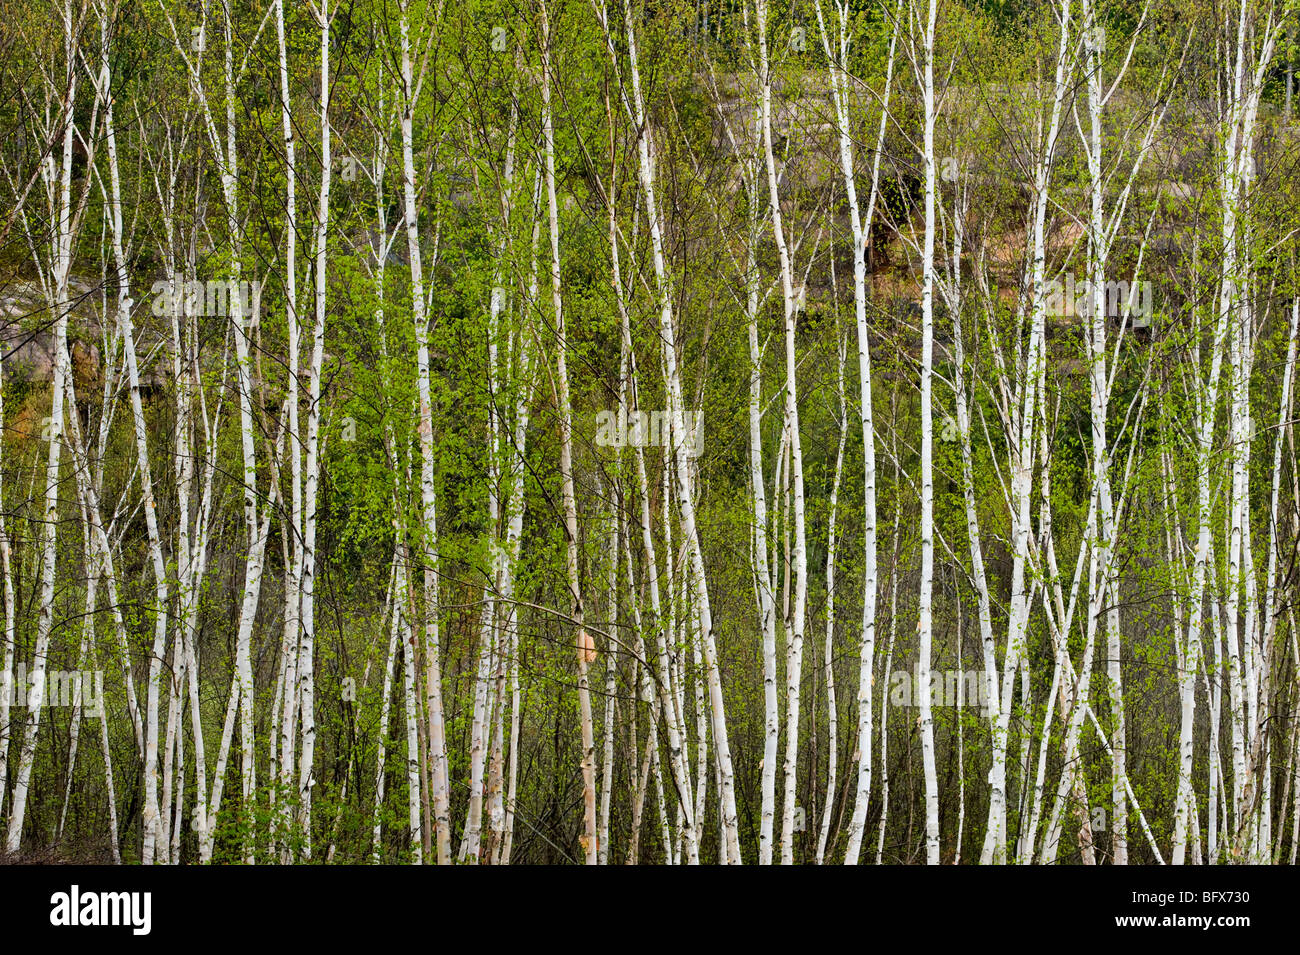 Birch tree trunks and fresh foliage, Greater Sudbury, Ontario, Canada - Stock Image